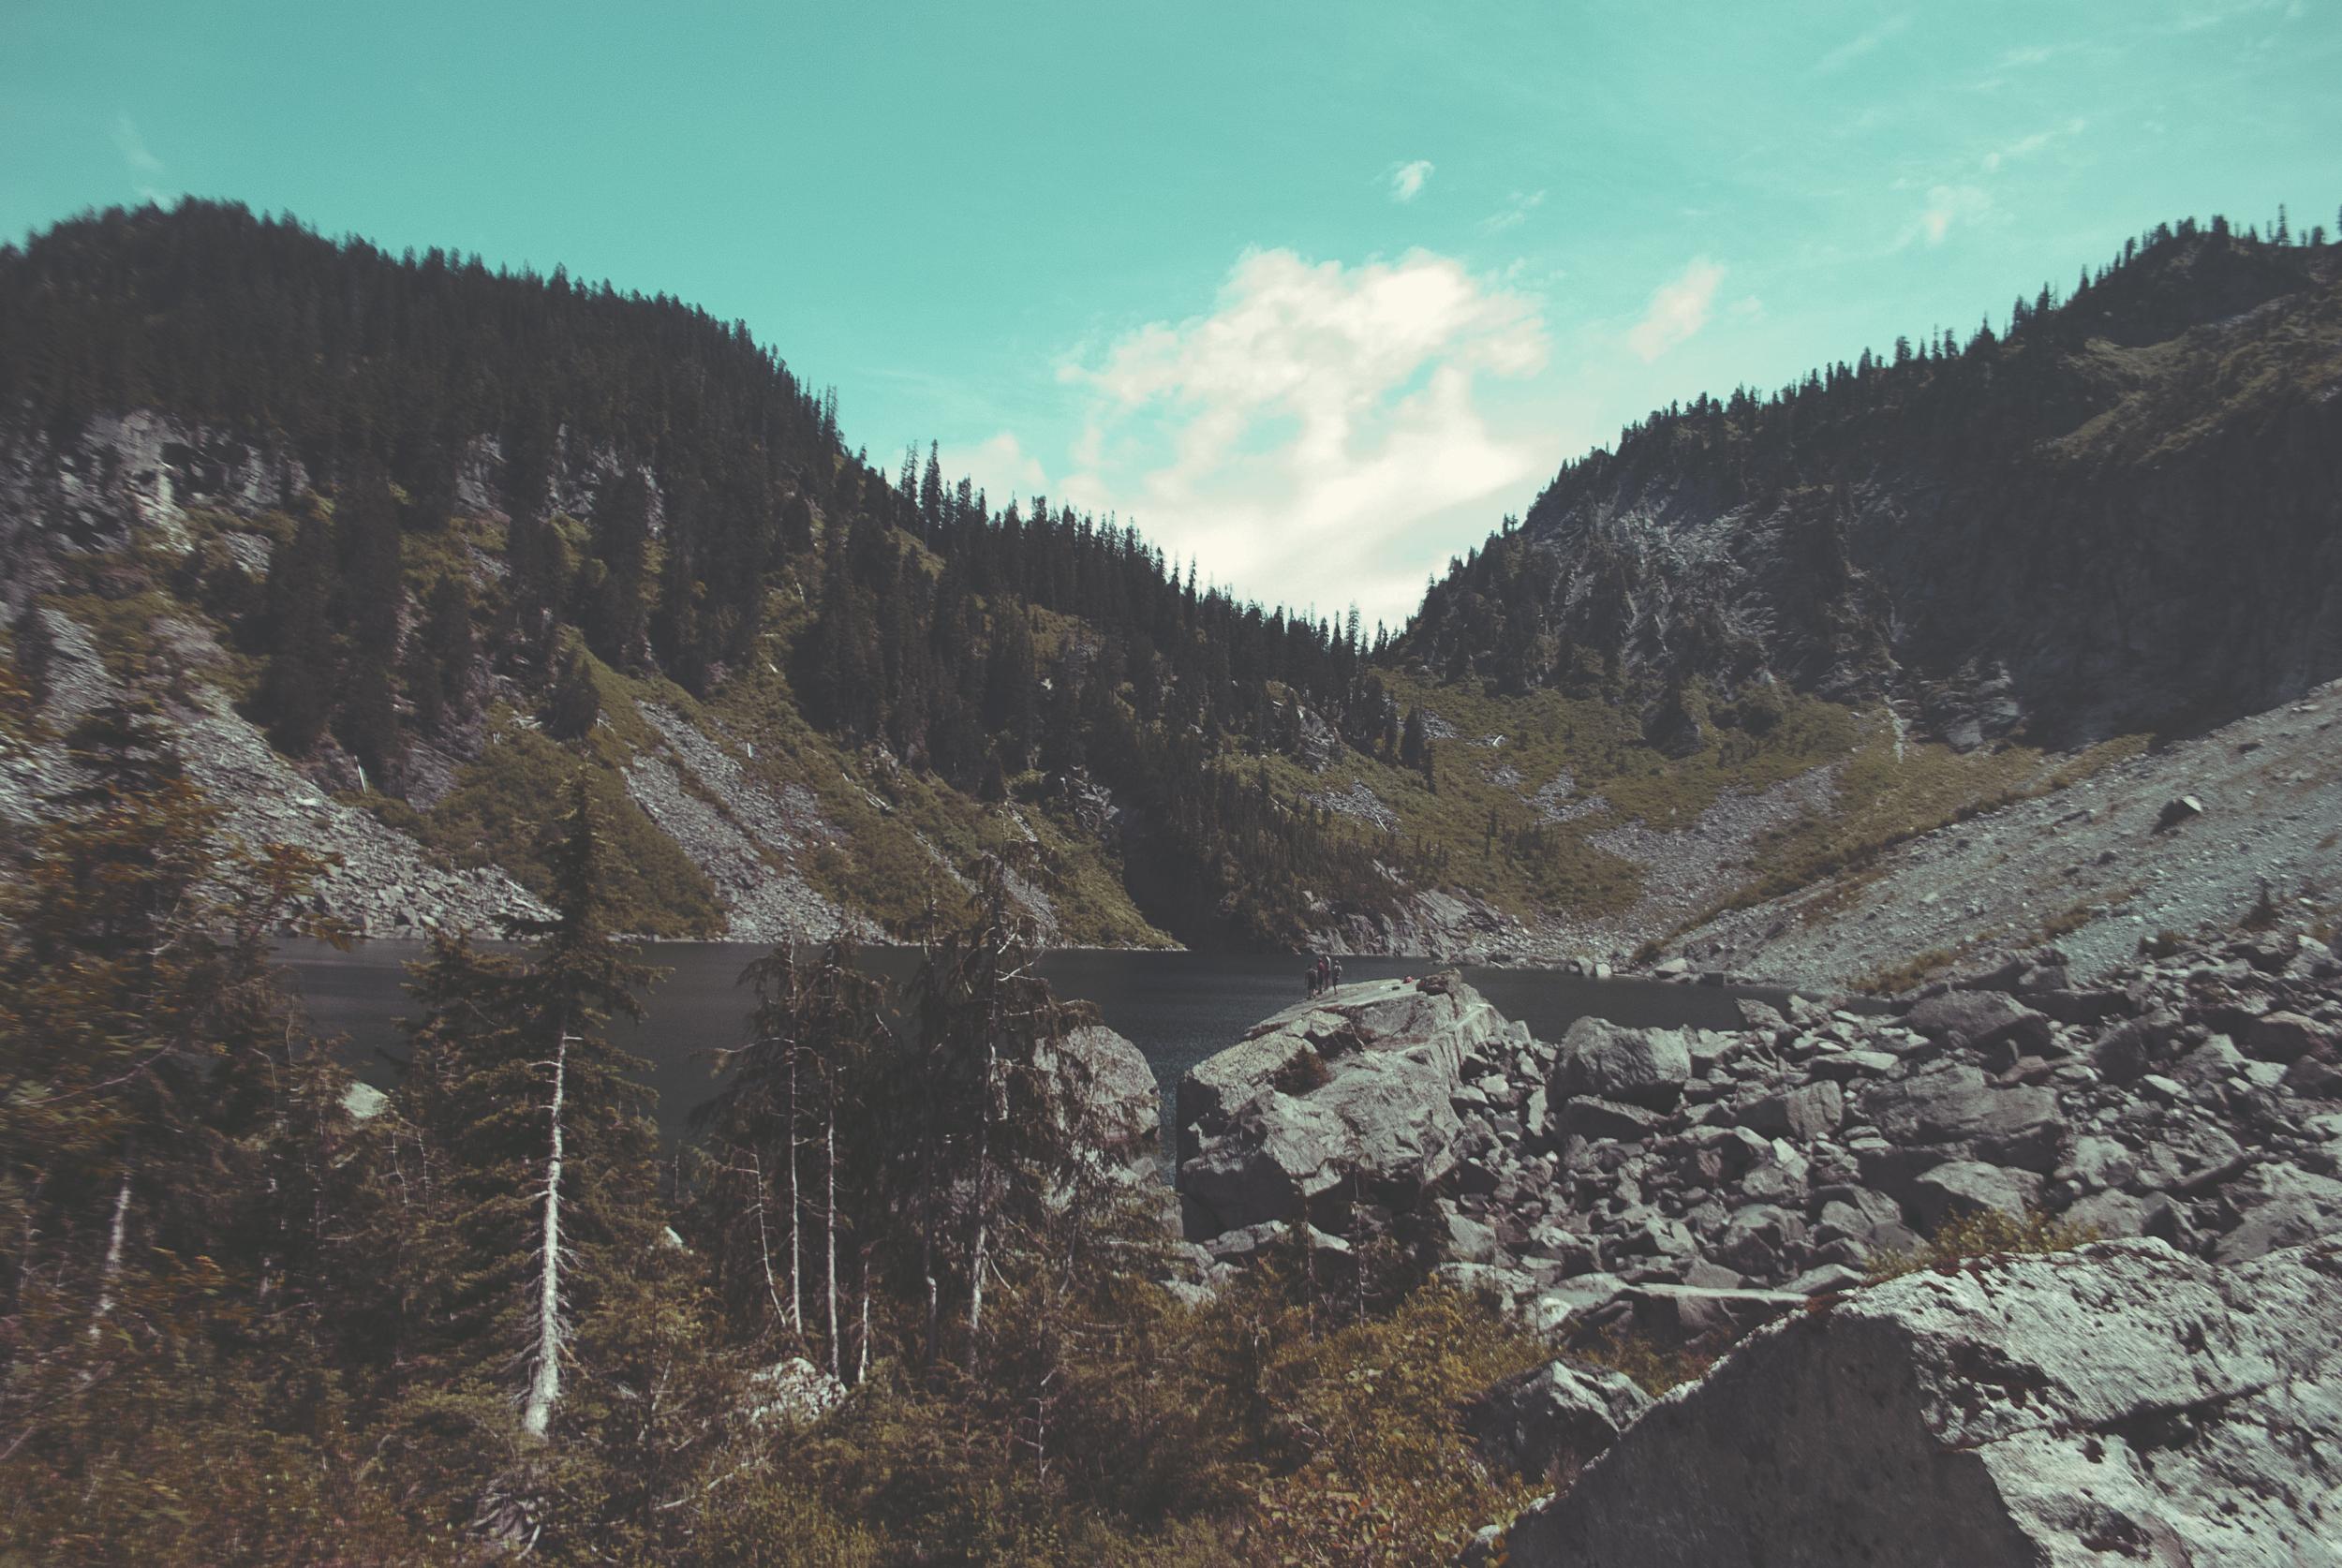 Seattle_lakeSerene_overview_mountain_trees_water_rocks_DSC0261.jpg